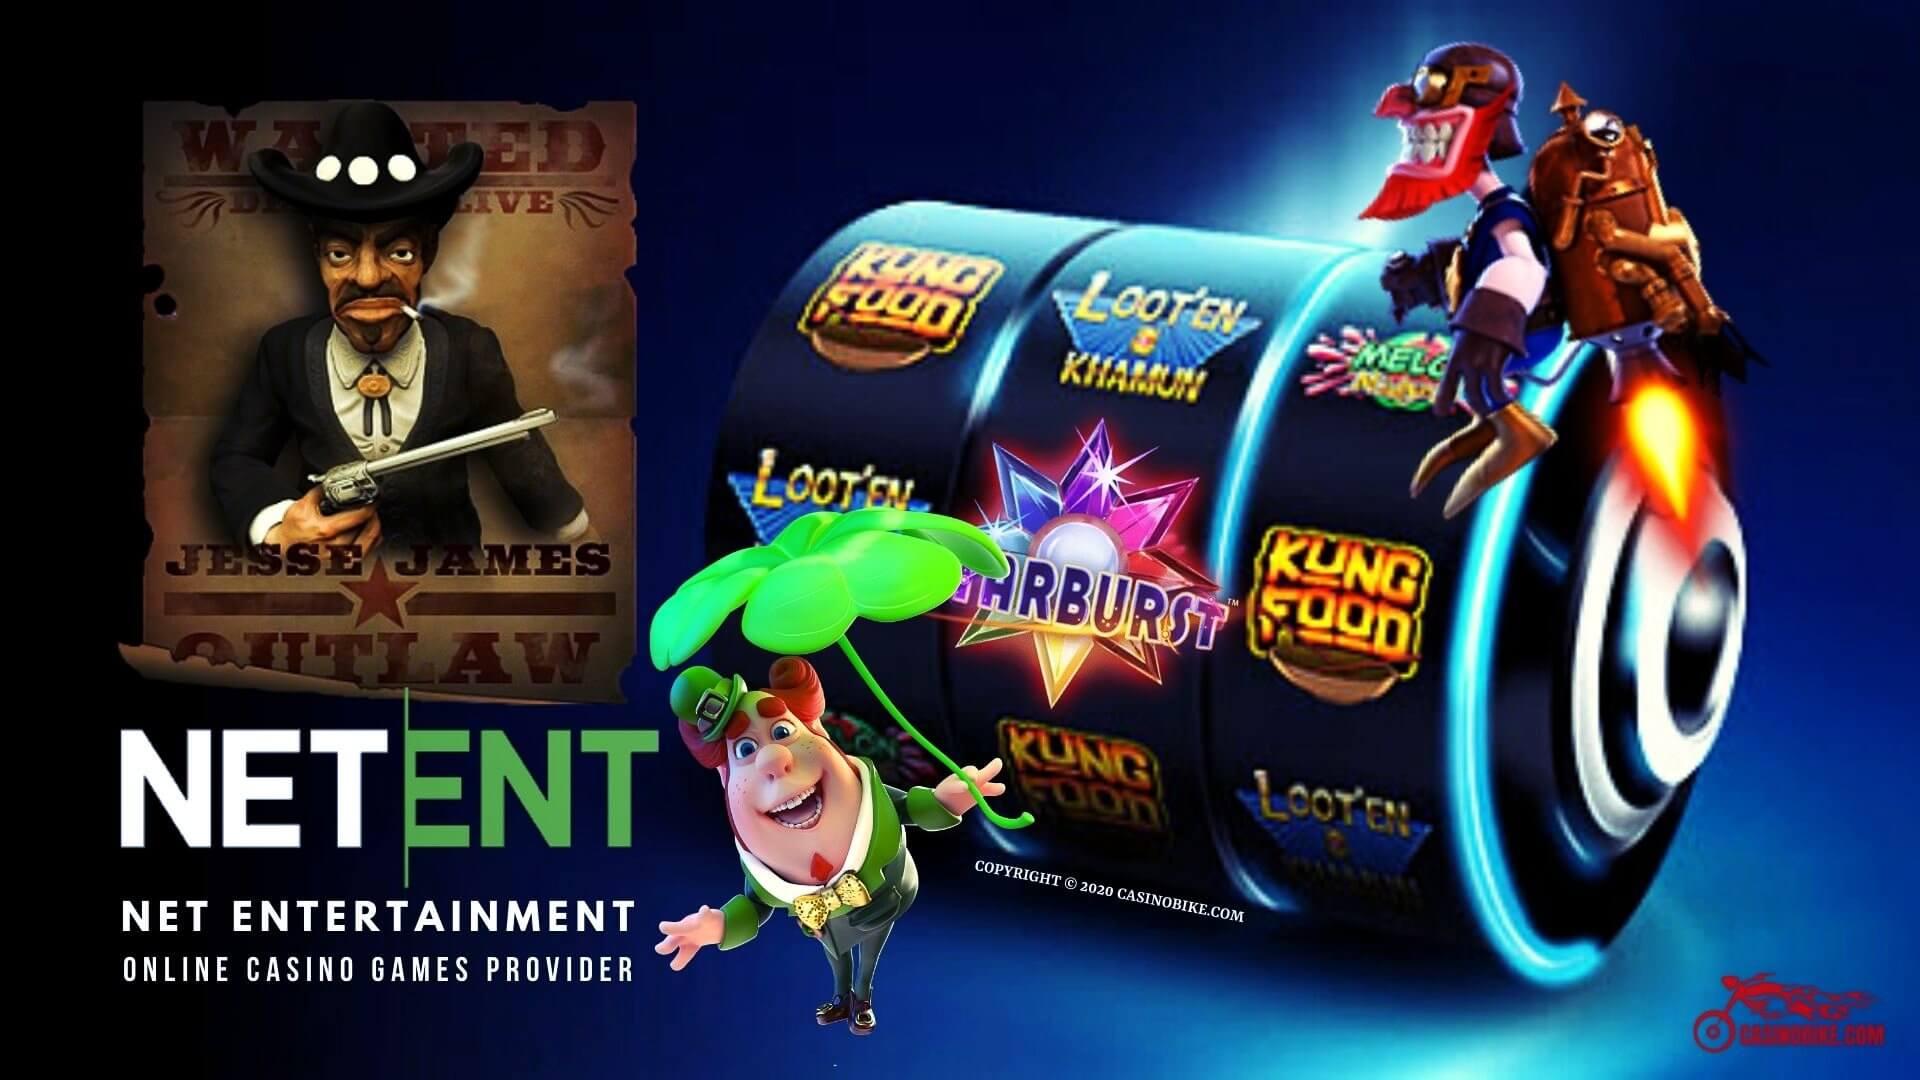 NetEnt Online Casino Slots Provider